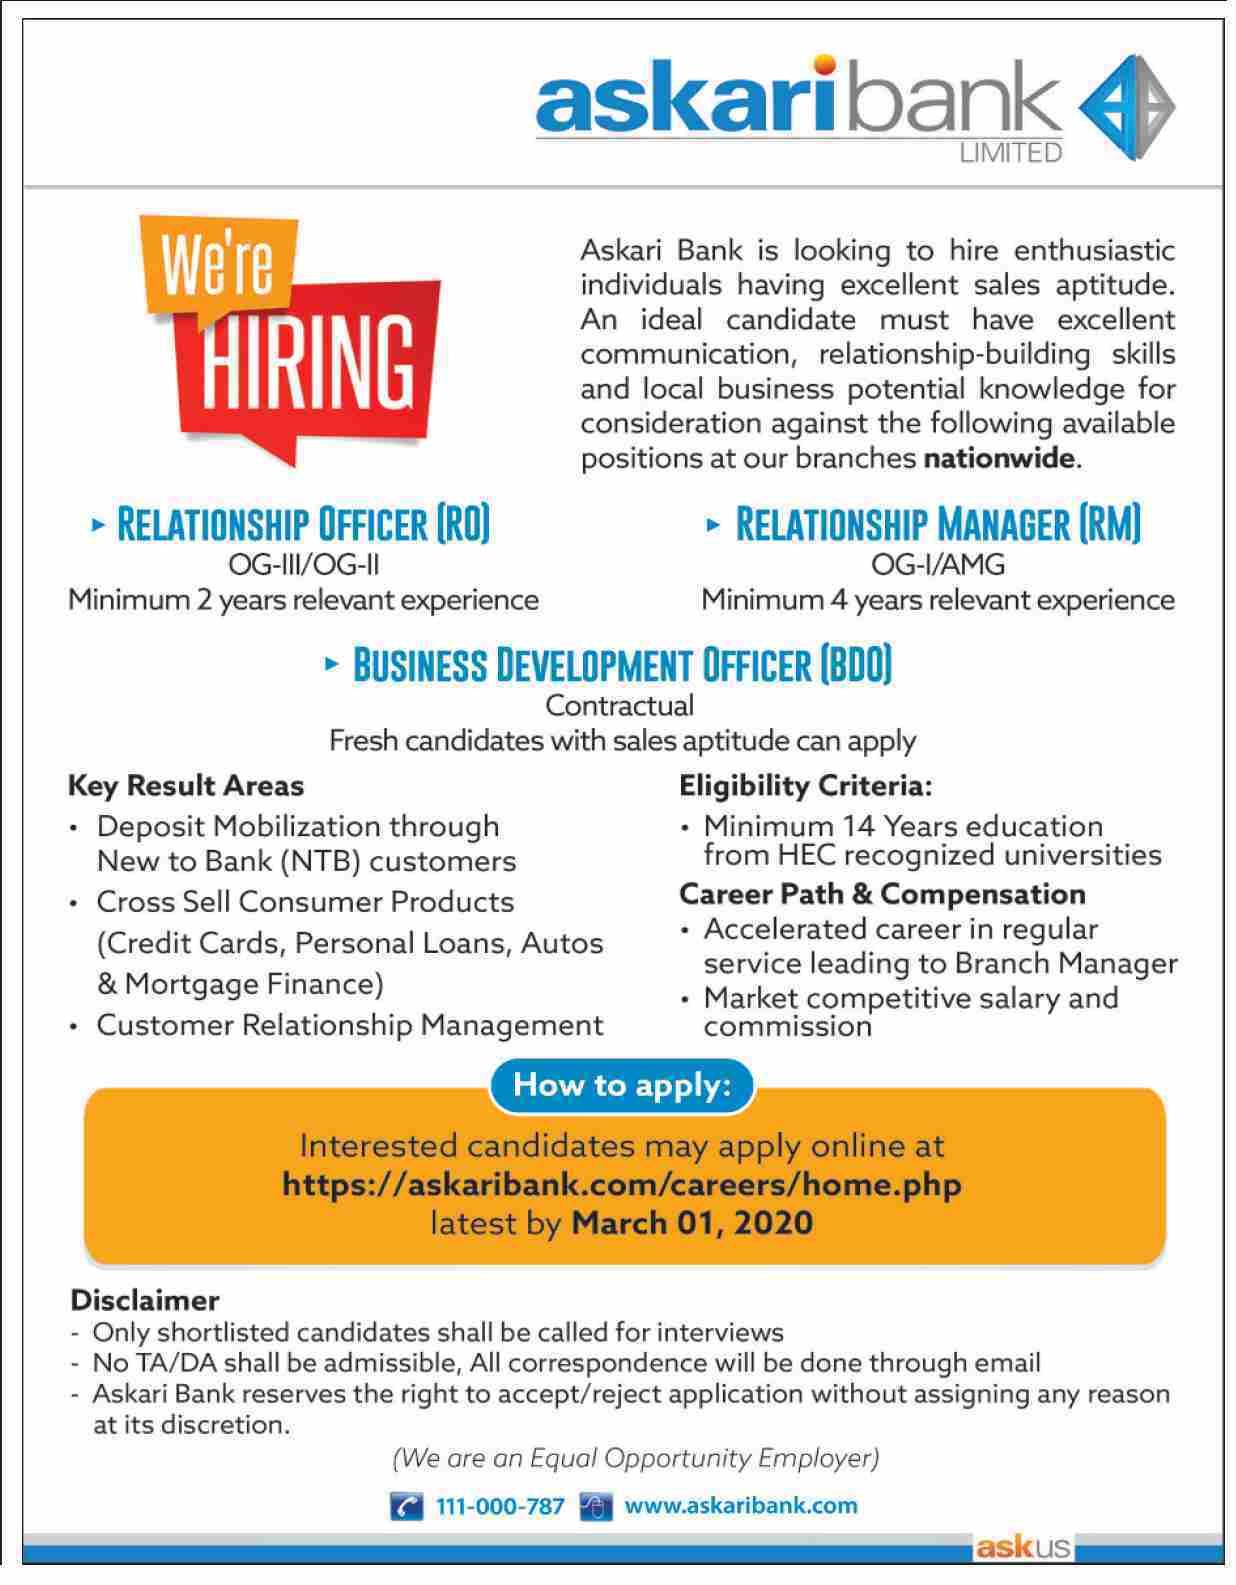 Latest-Askari-Bank-Limited-Jobs-17-Feb-2020